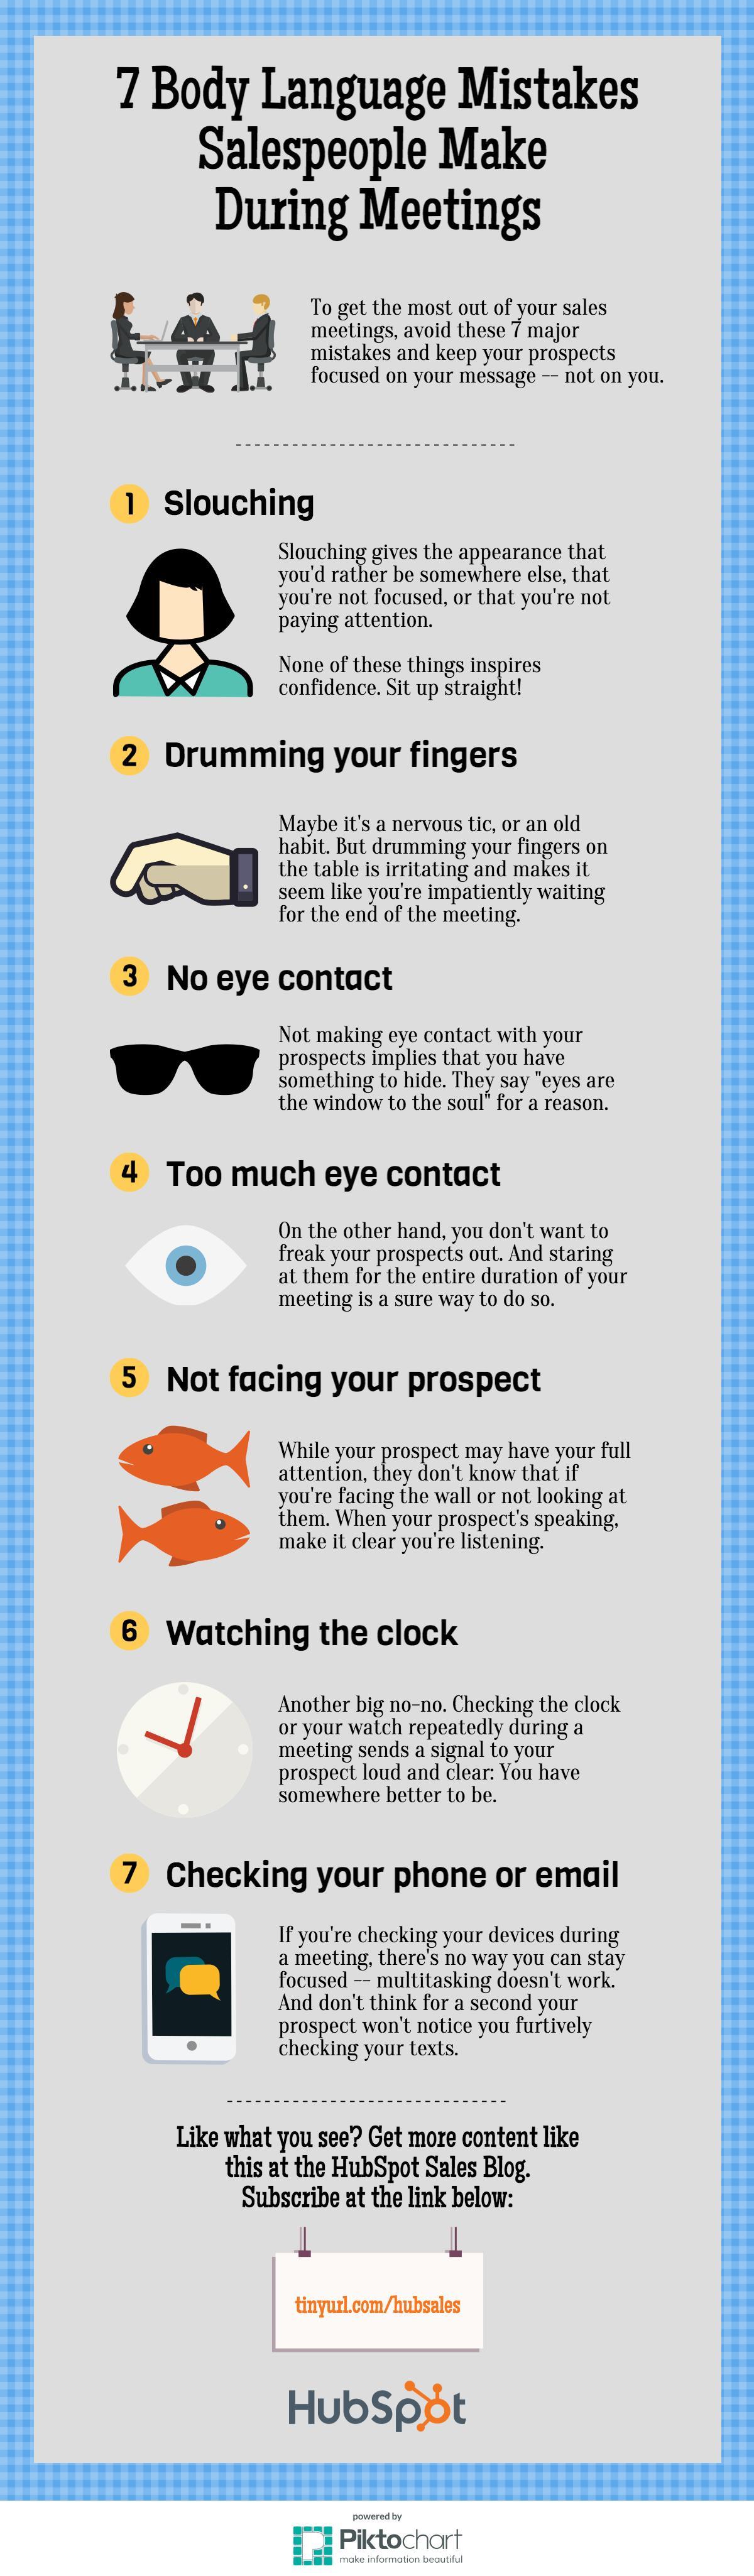 7 Cringeworthy Body Language Mistakes Salespeople Make During Meetings